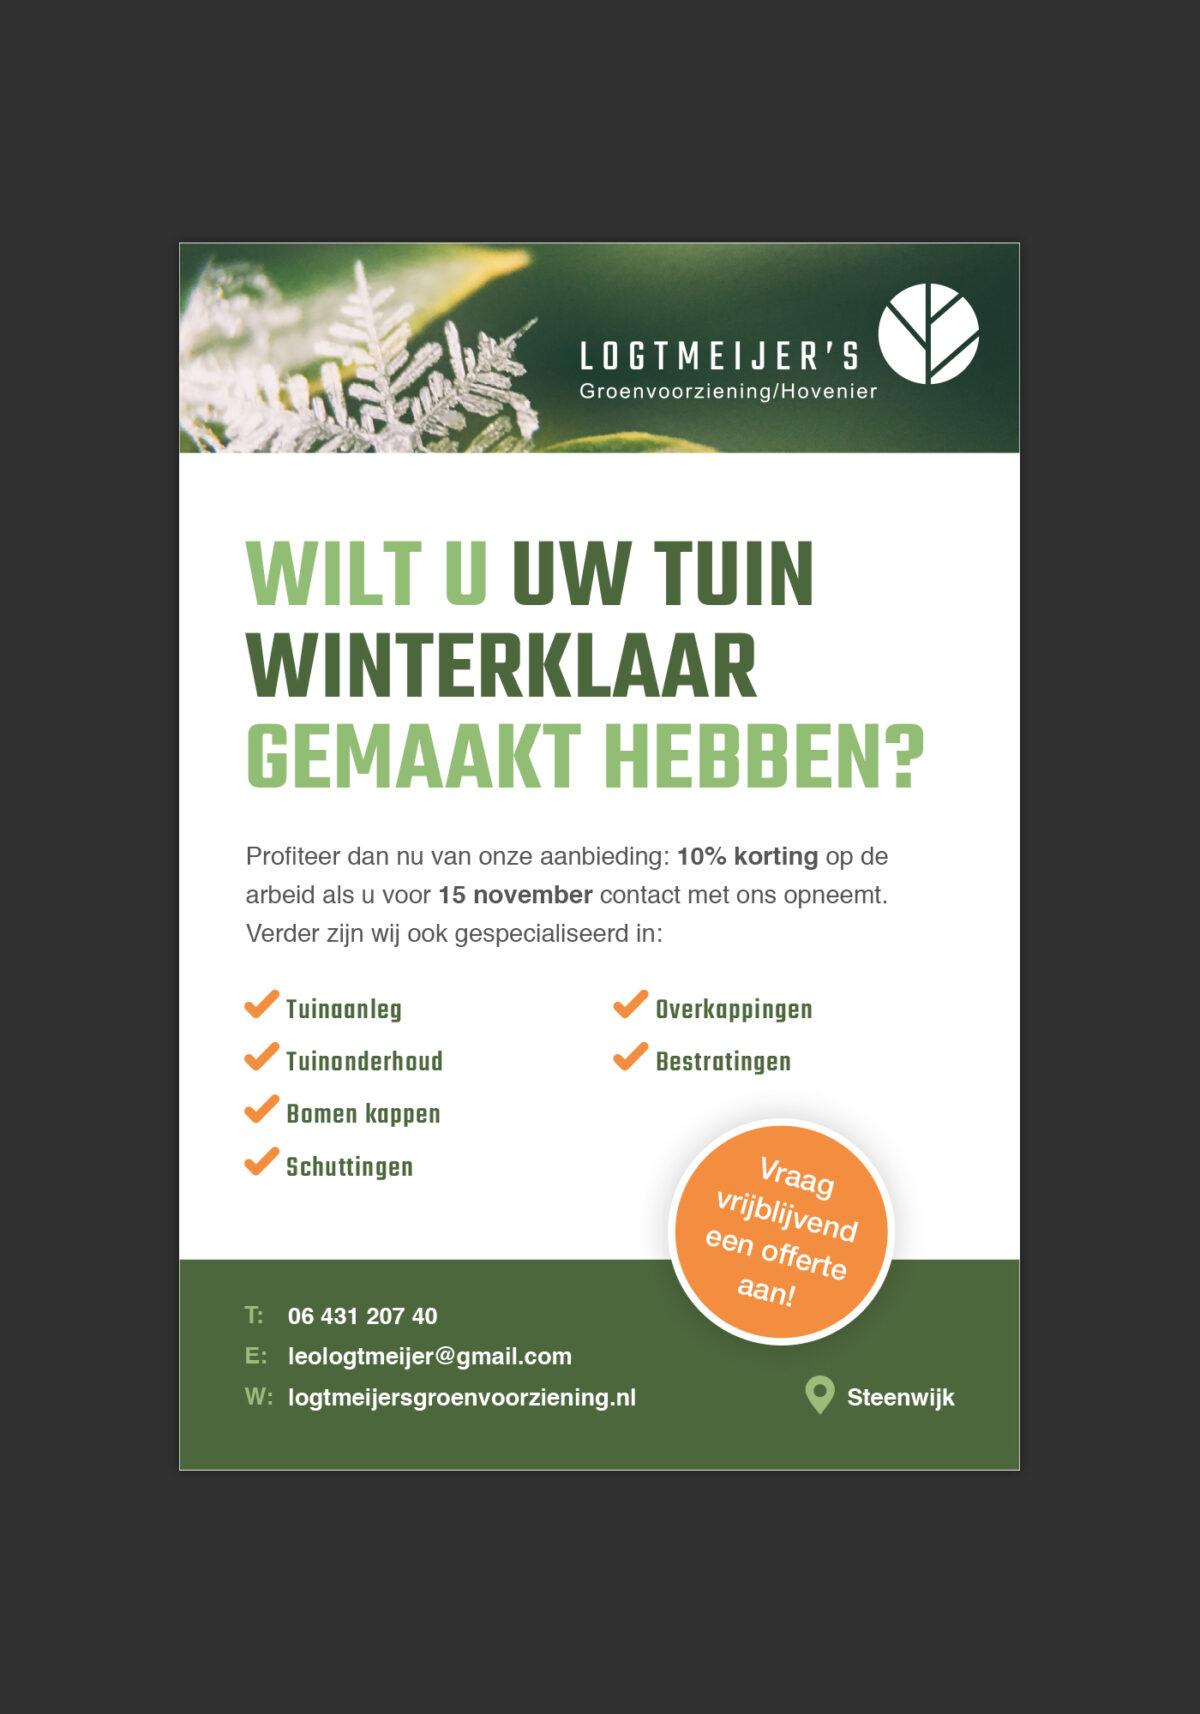 Advertentie Logtmeijers groenvoorziening